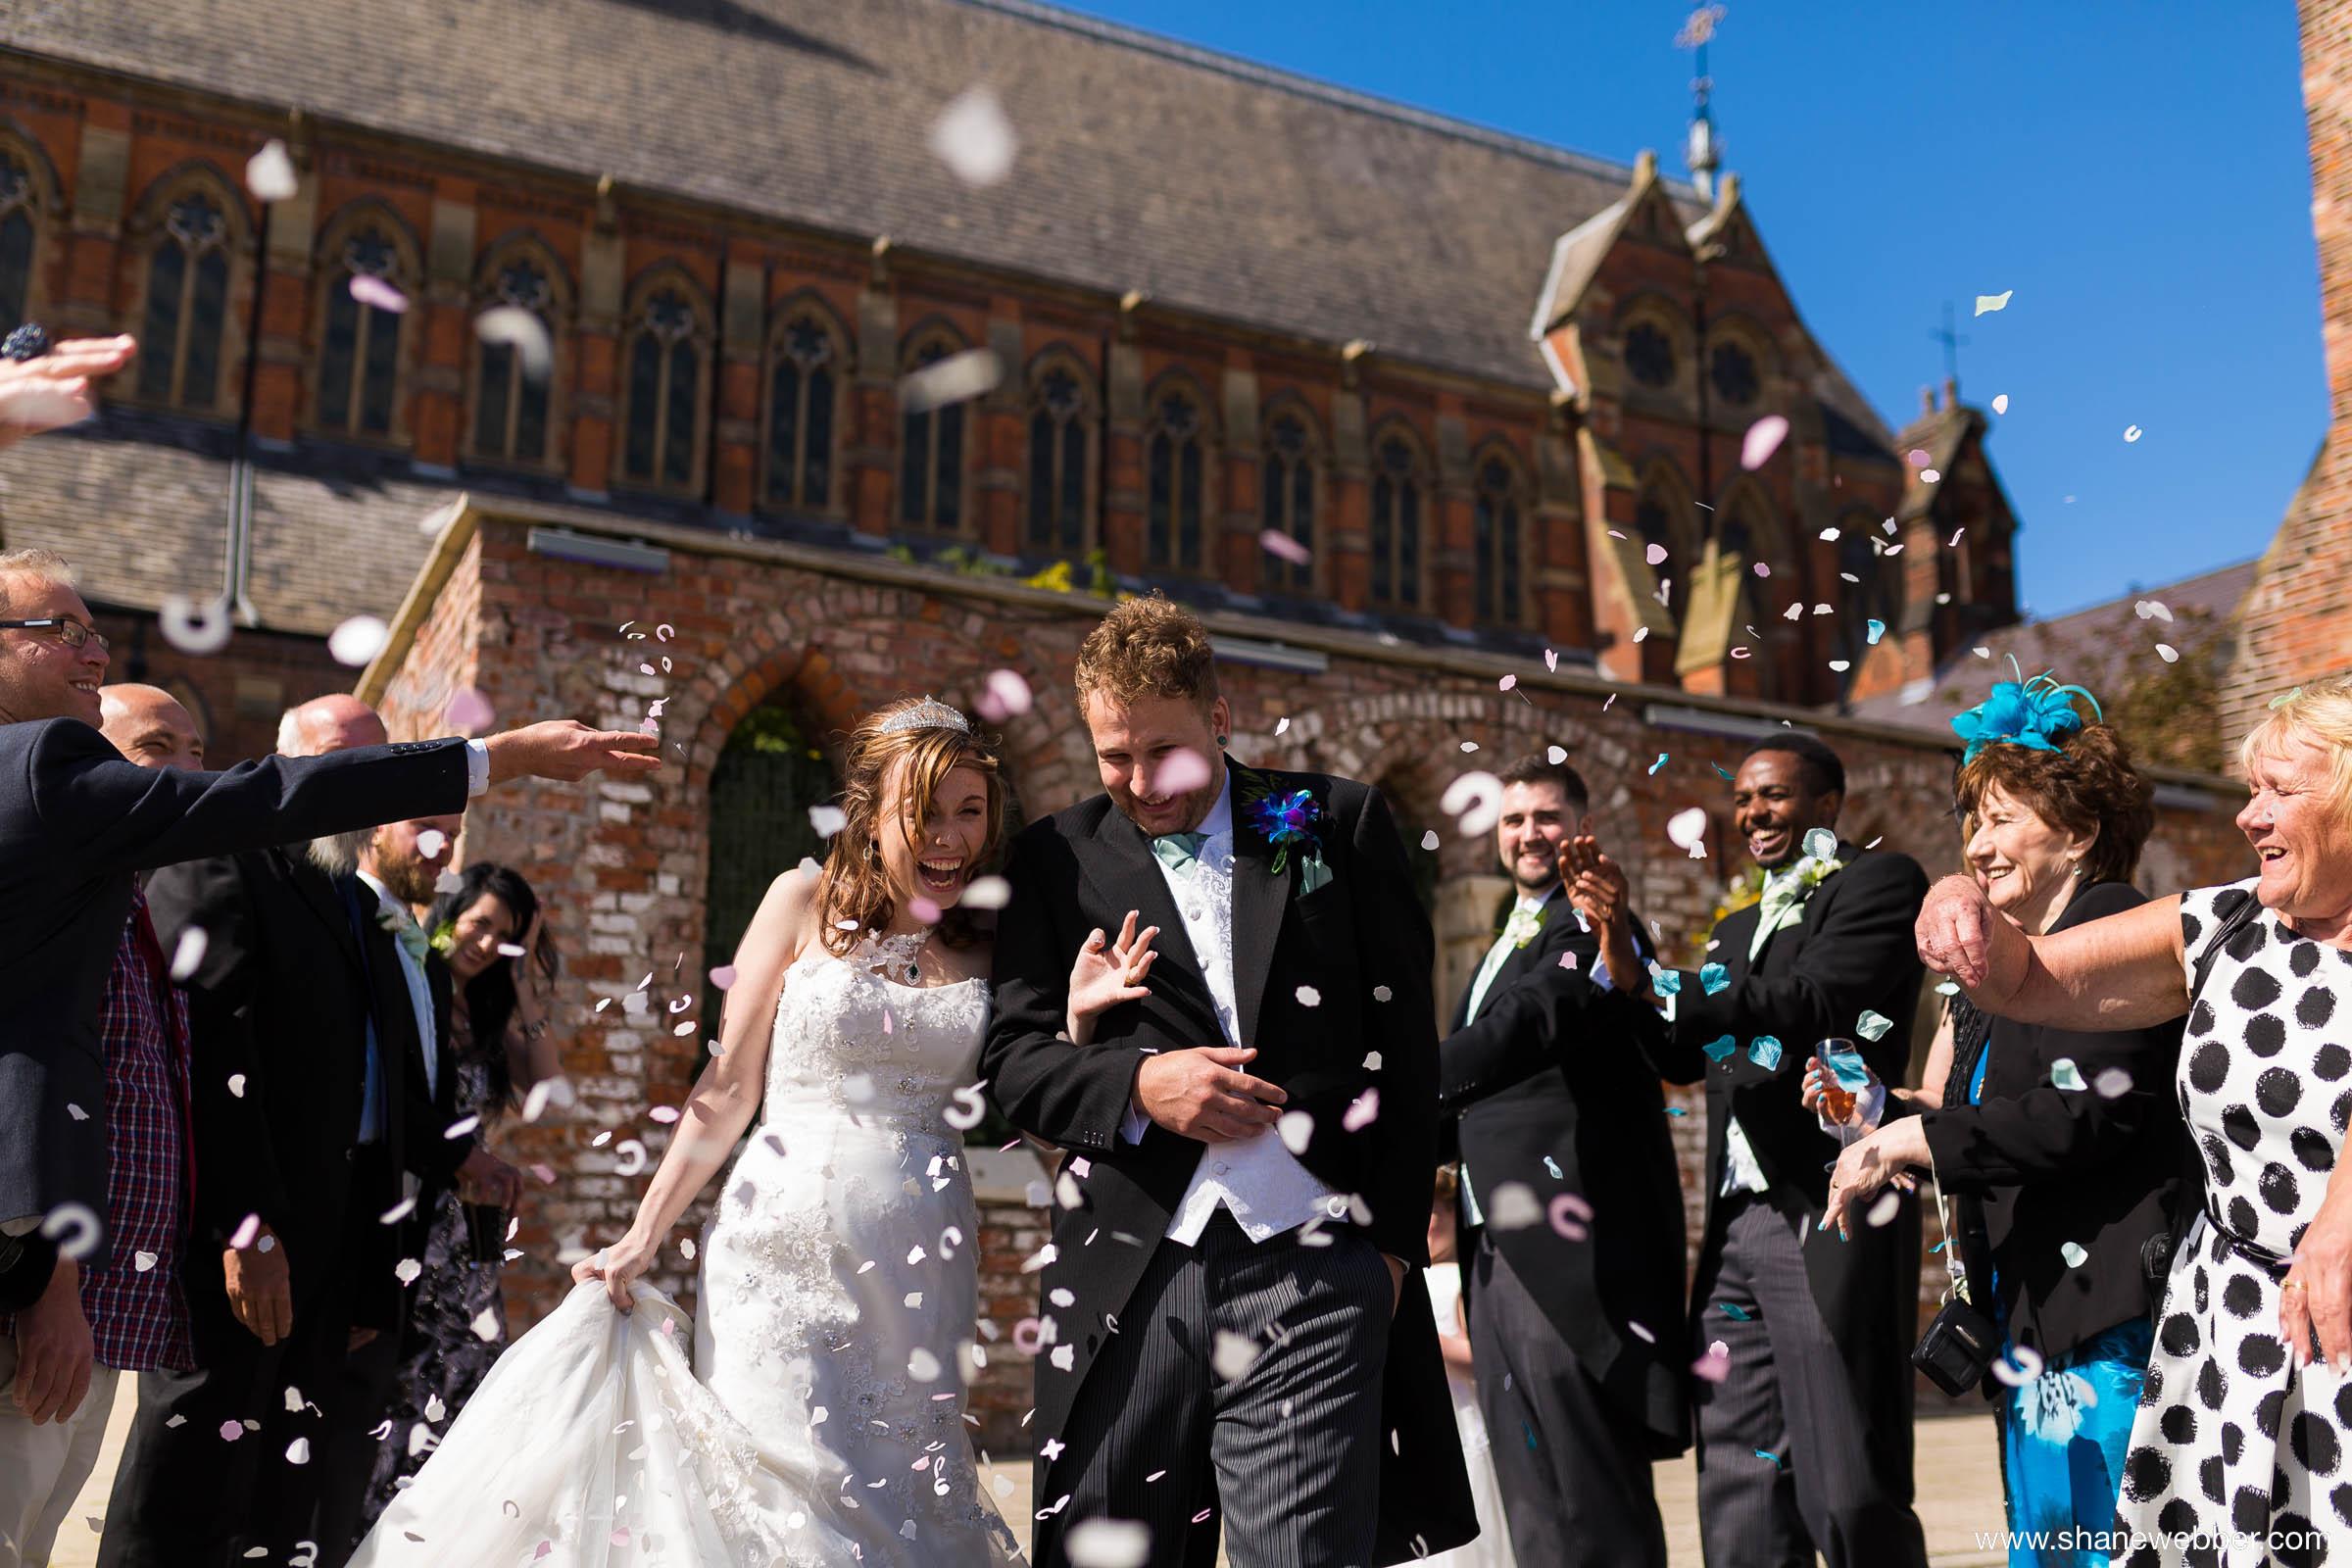 Gorton Monastery Manchester wedding